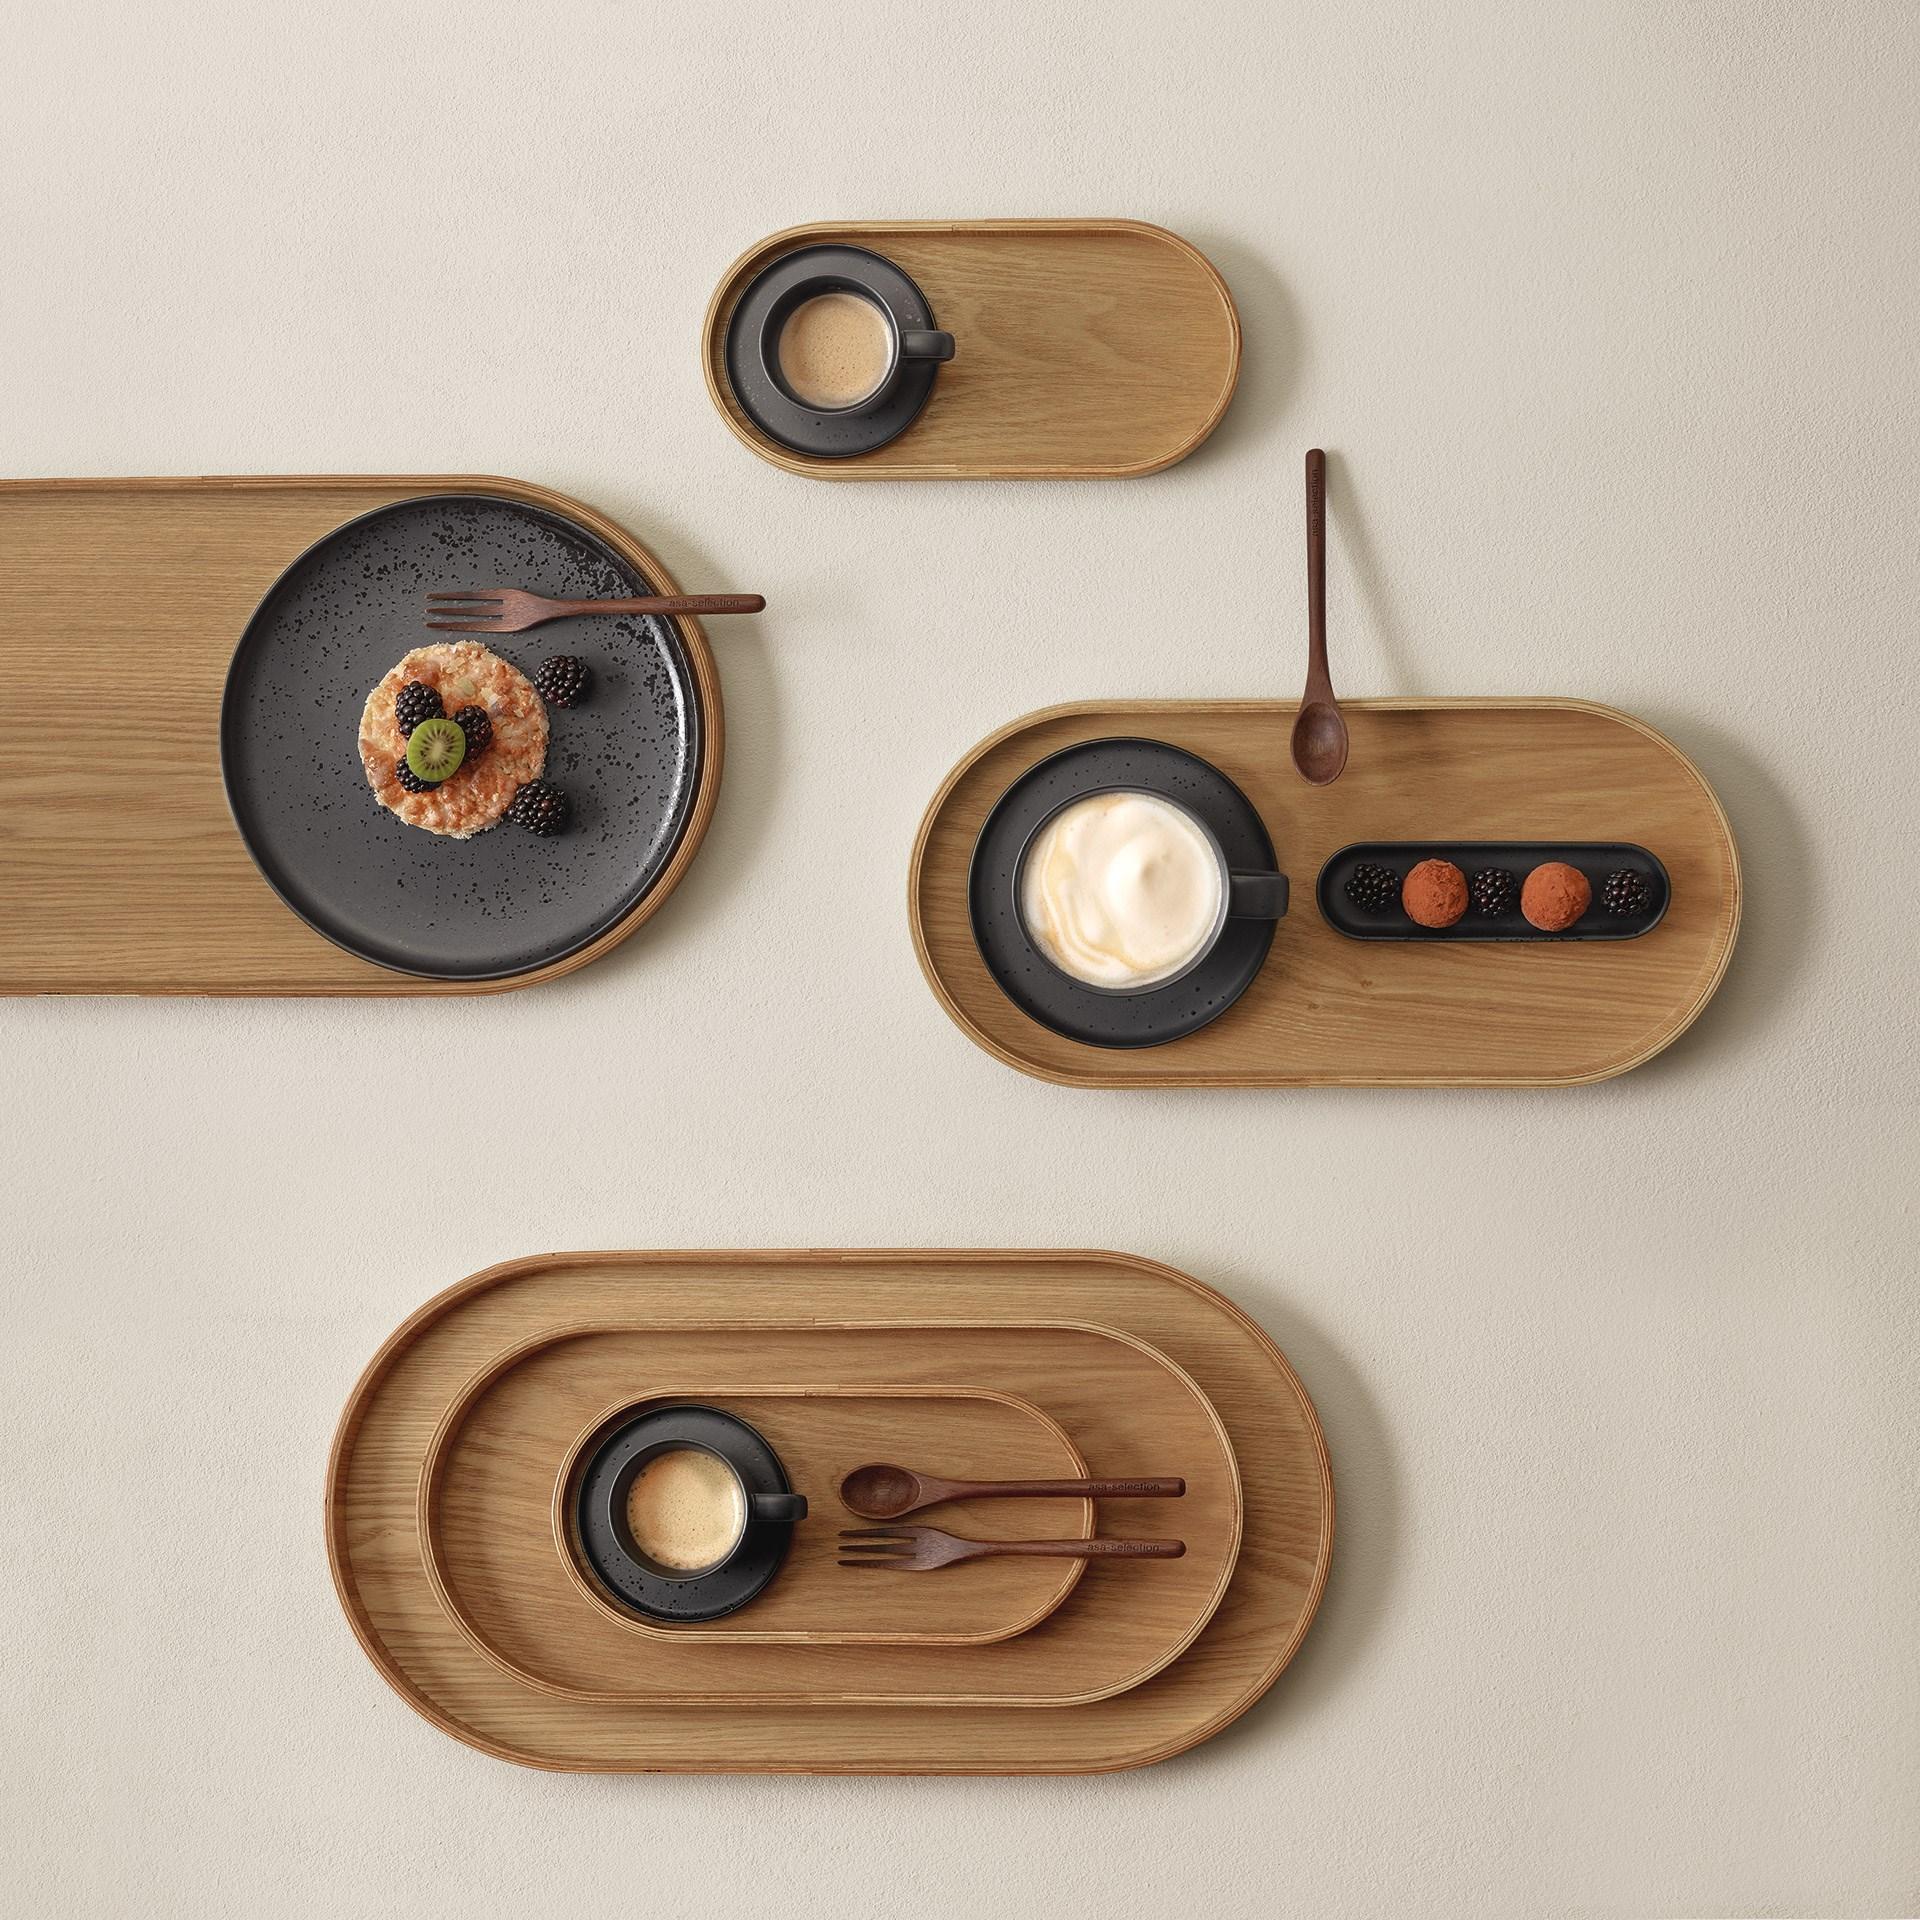 Dřevěný tác SONOKO oválný 23x11 cm_1